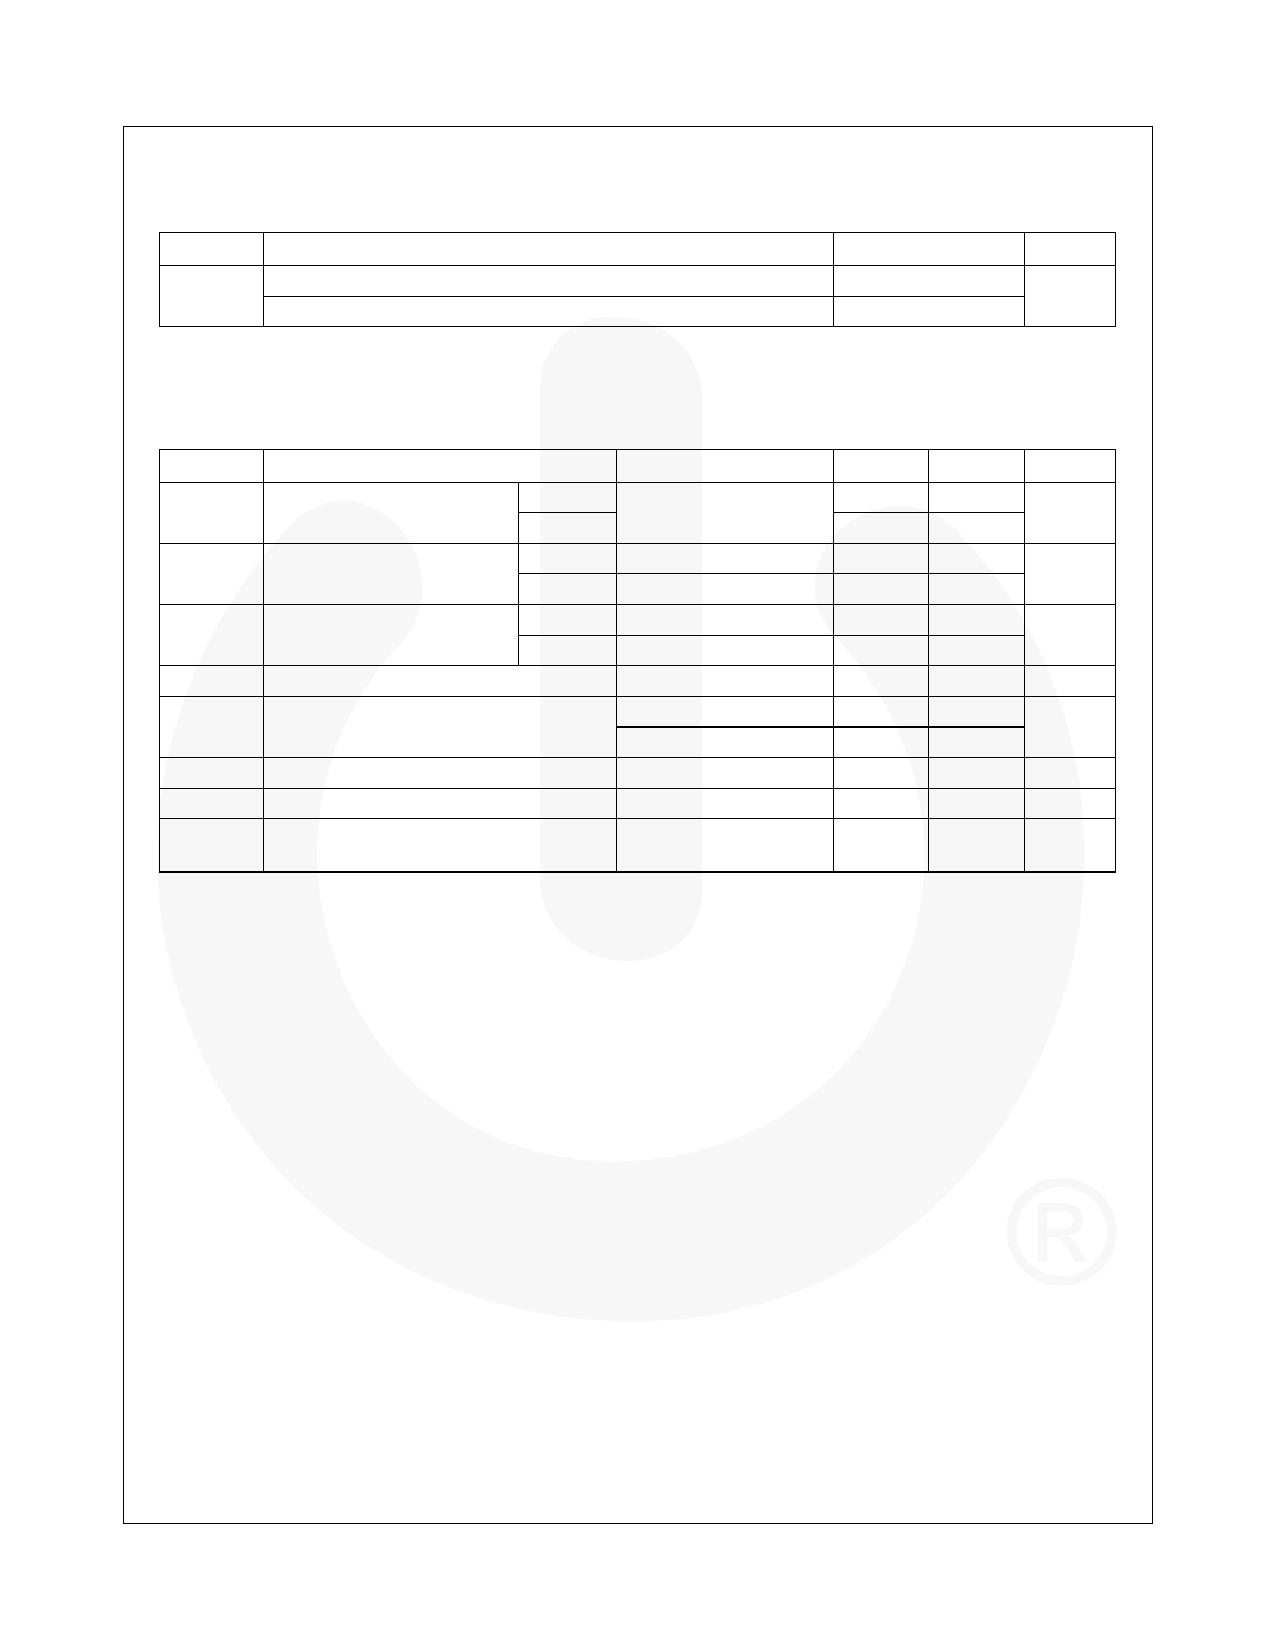 TIP31A pdf, schematic